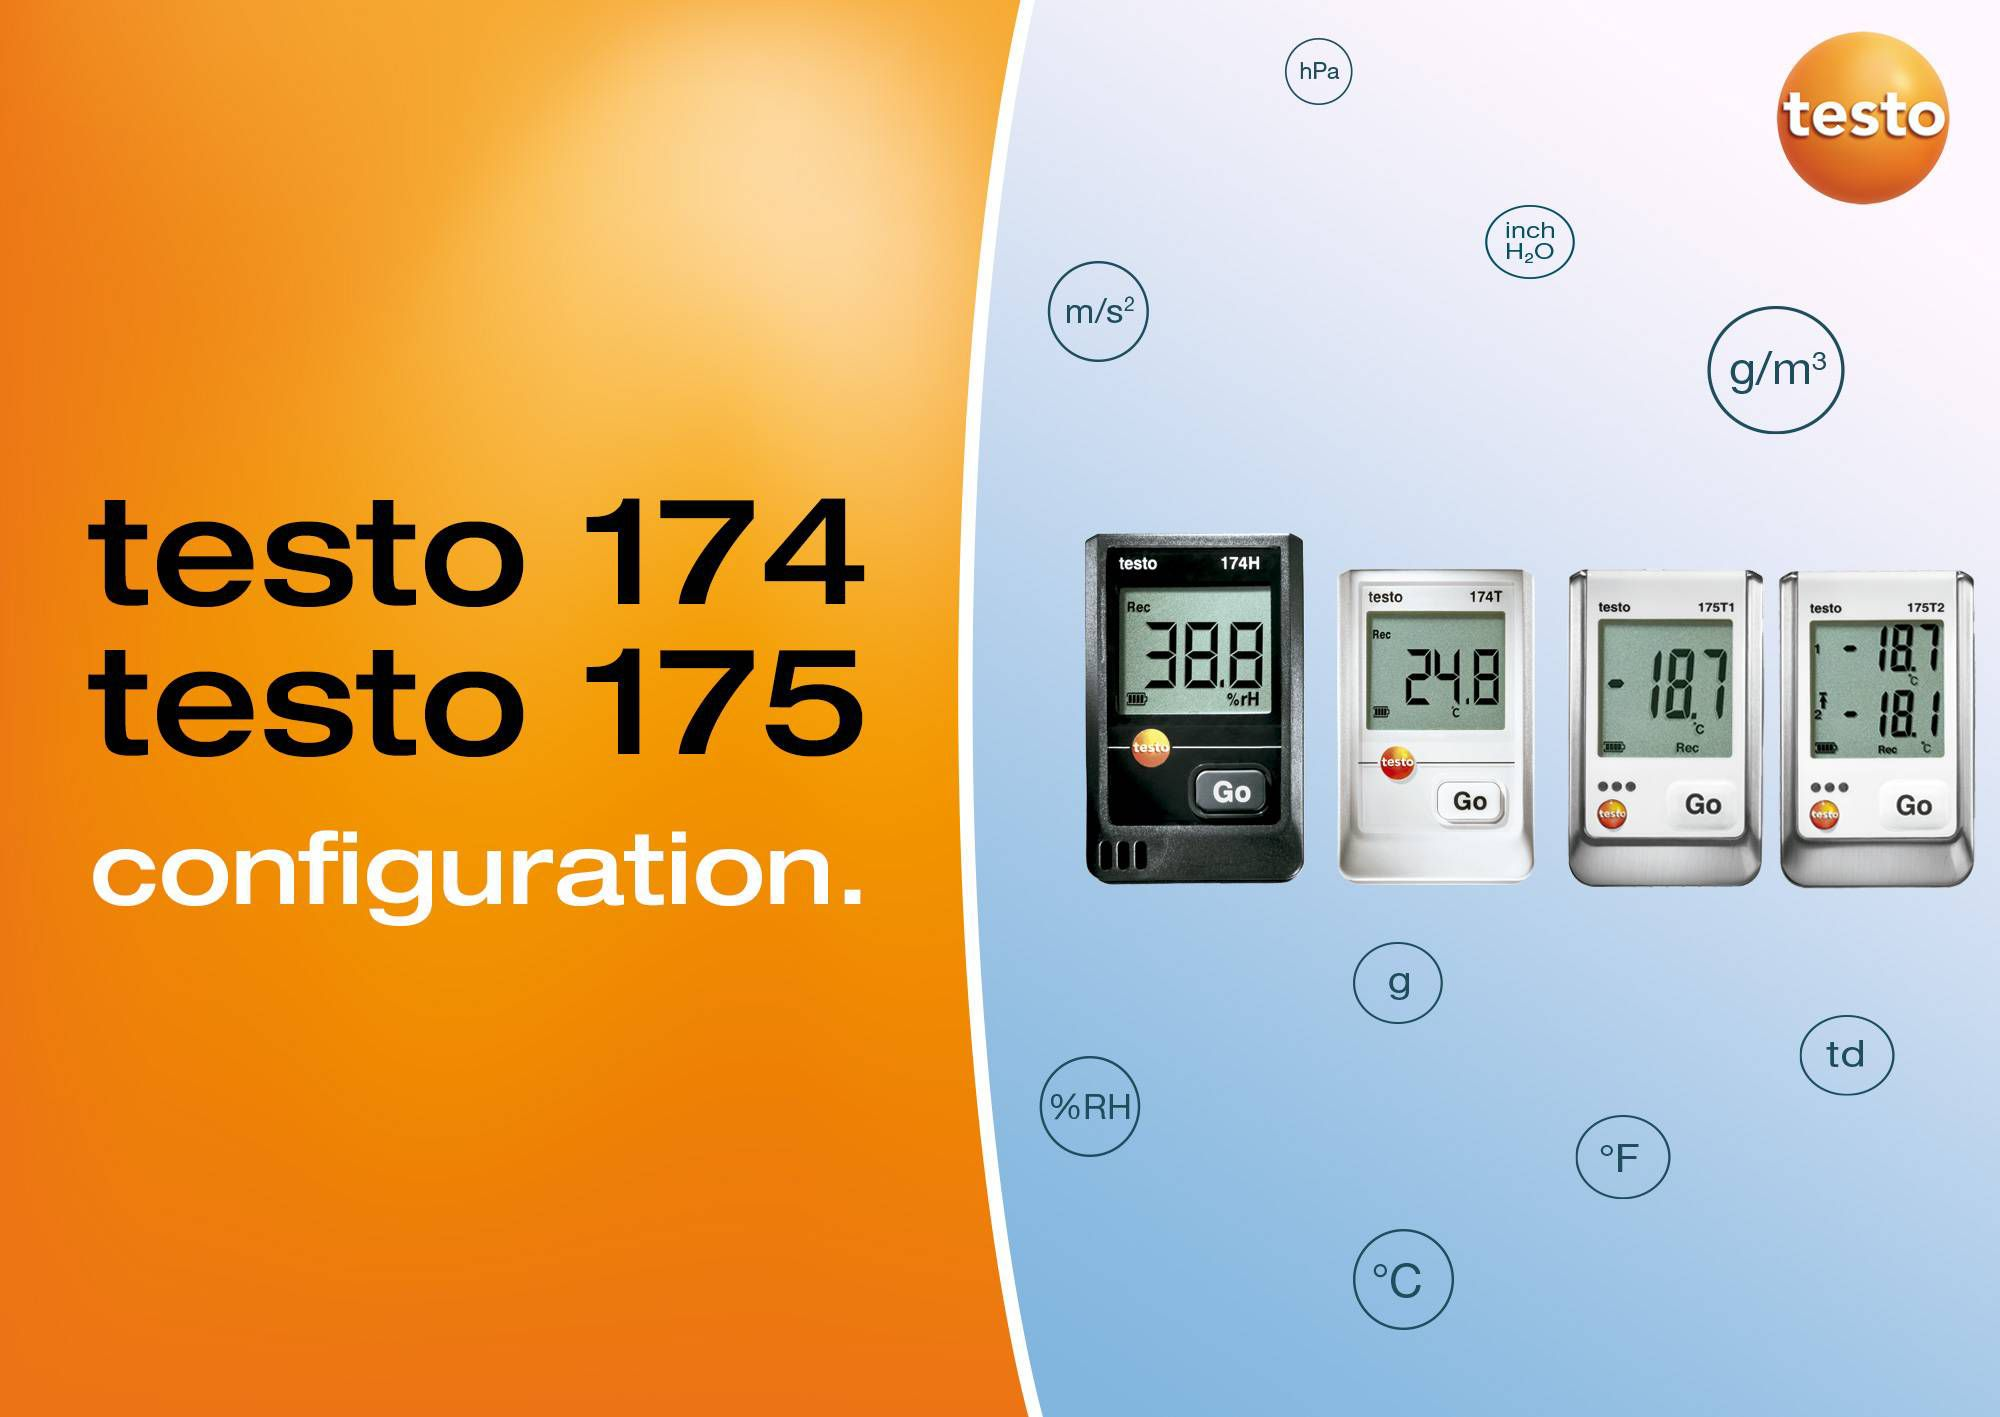 configuration-174-175.jpg